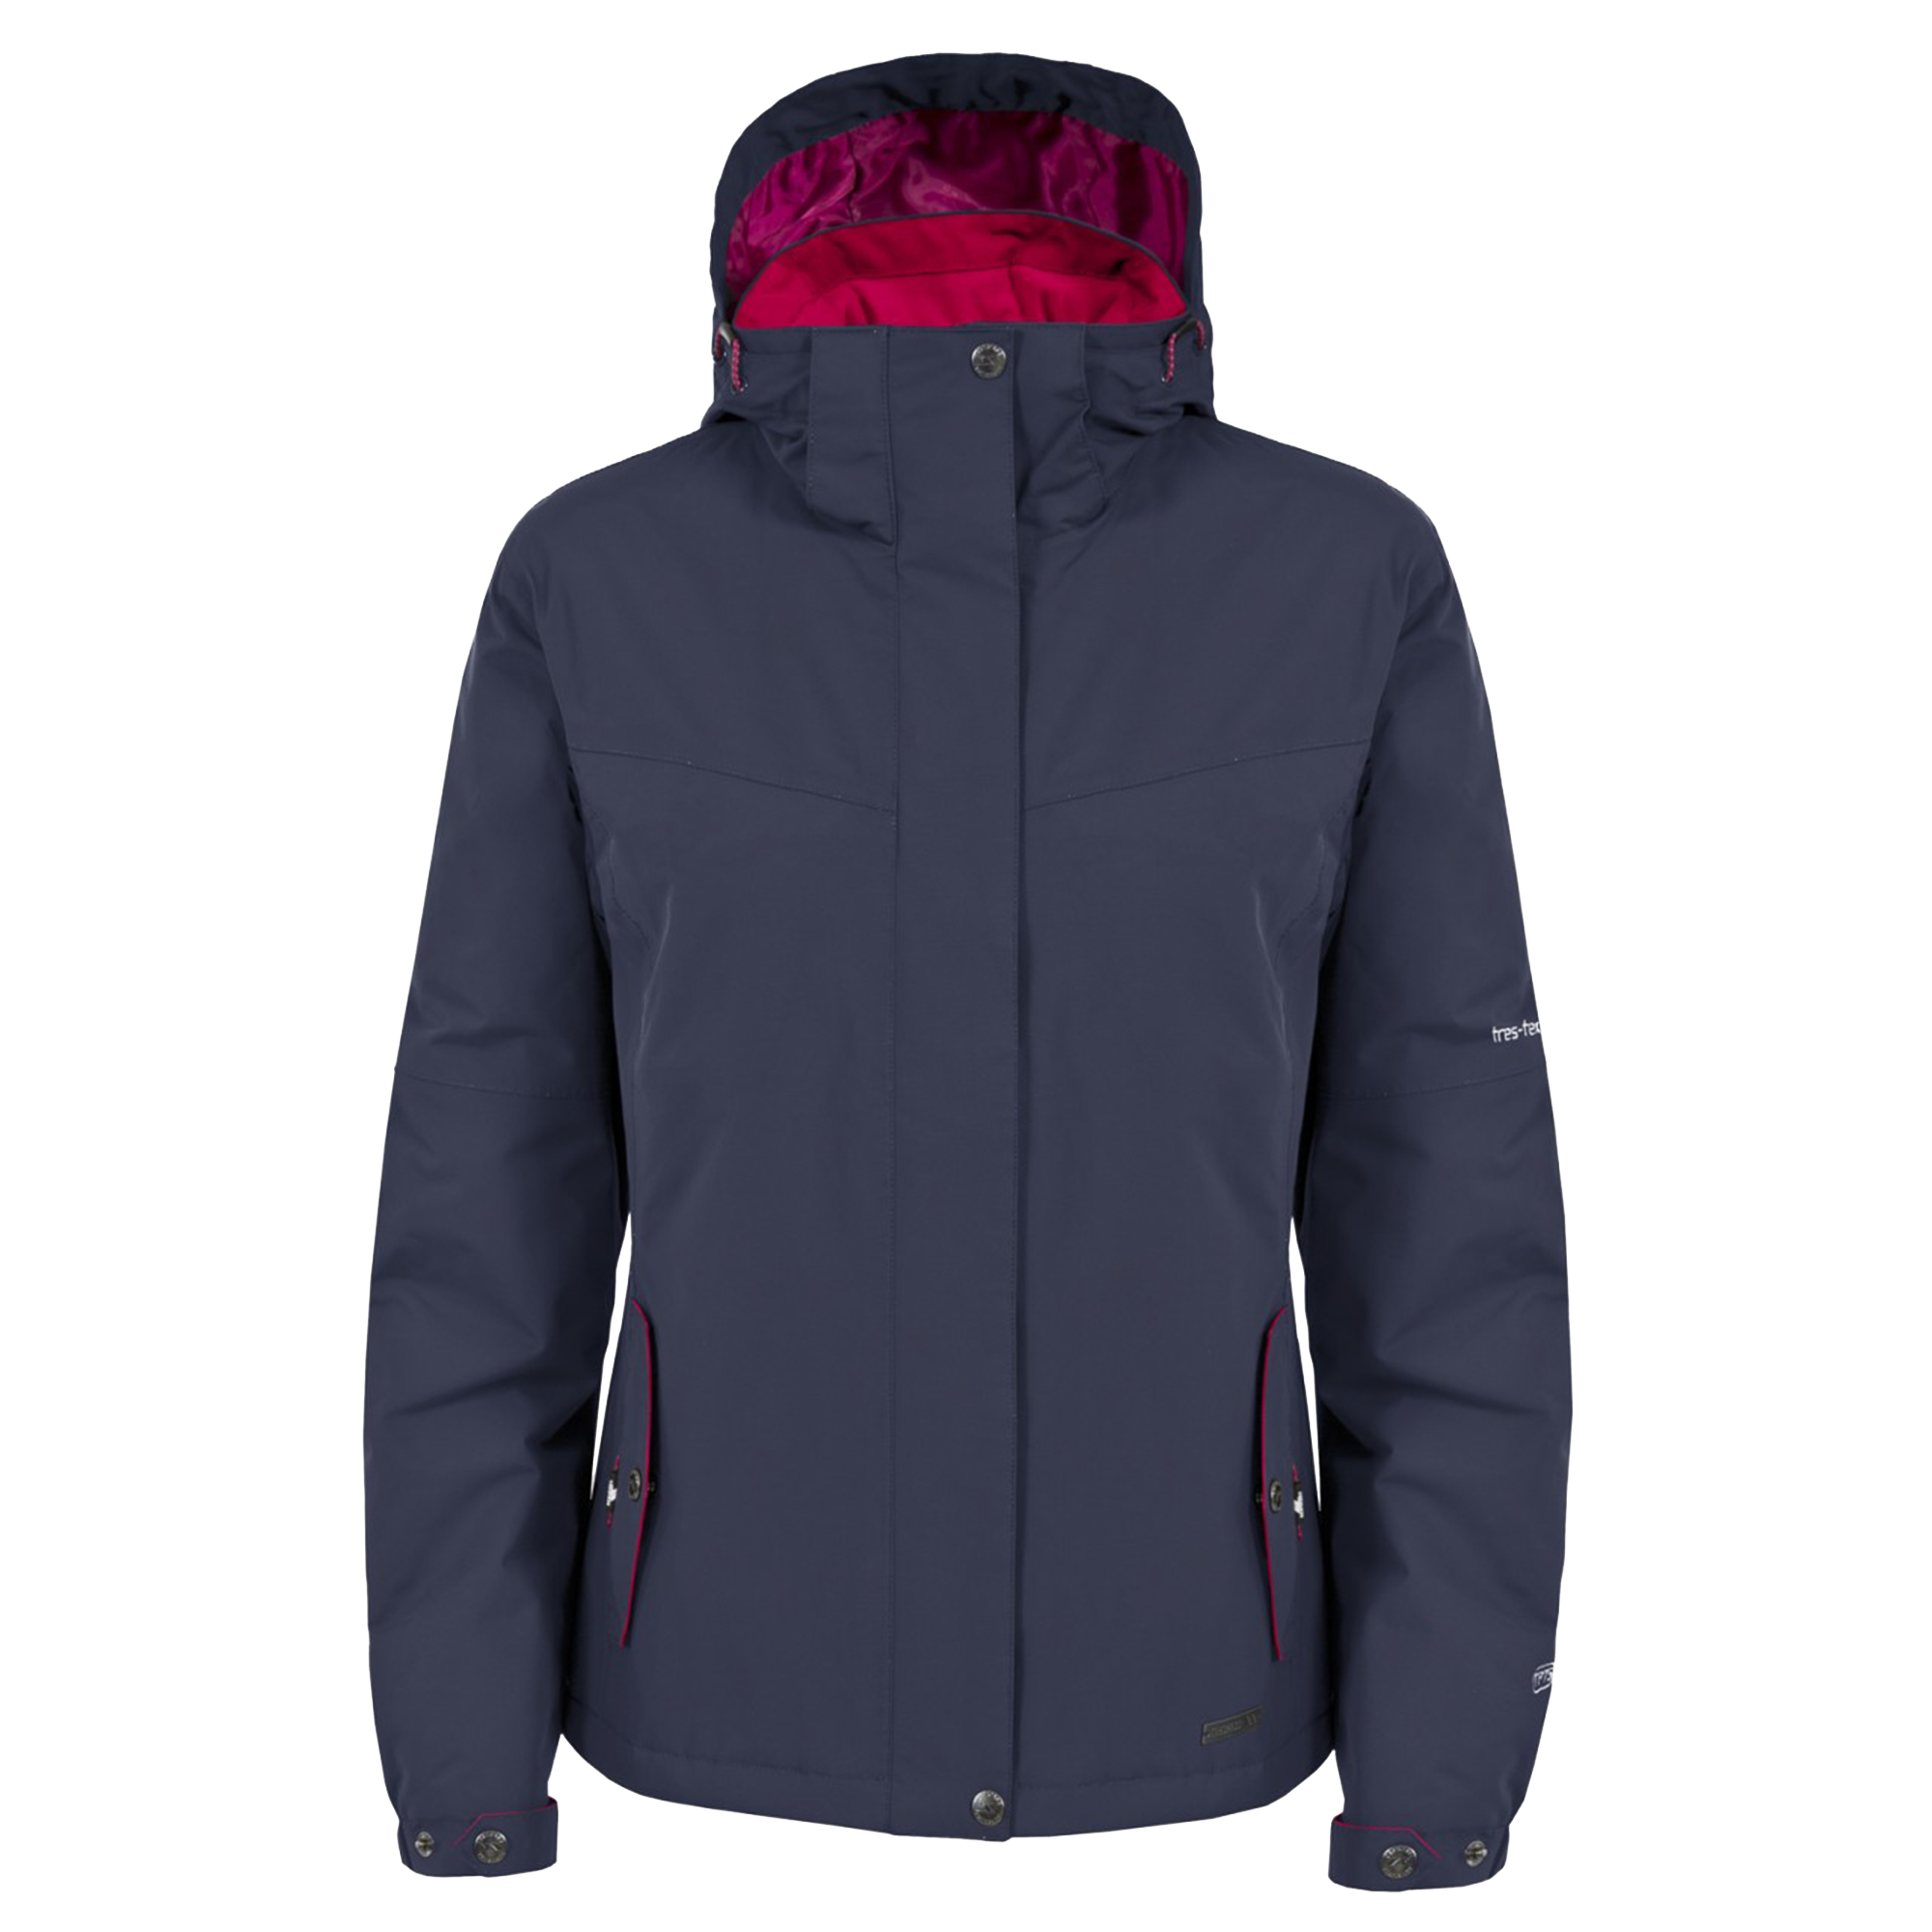 Trespass-Womens-Ladies-Malissa-Lightly-Padded-Waterproof-Jacket-TP3070 thumbnail 4